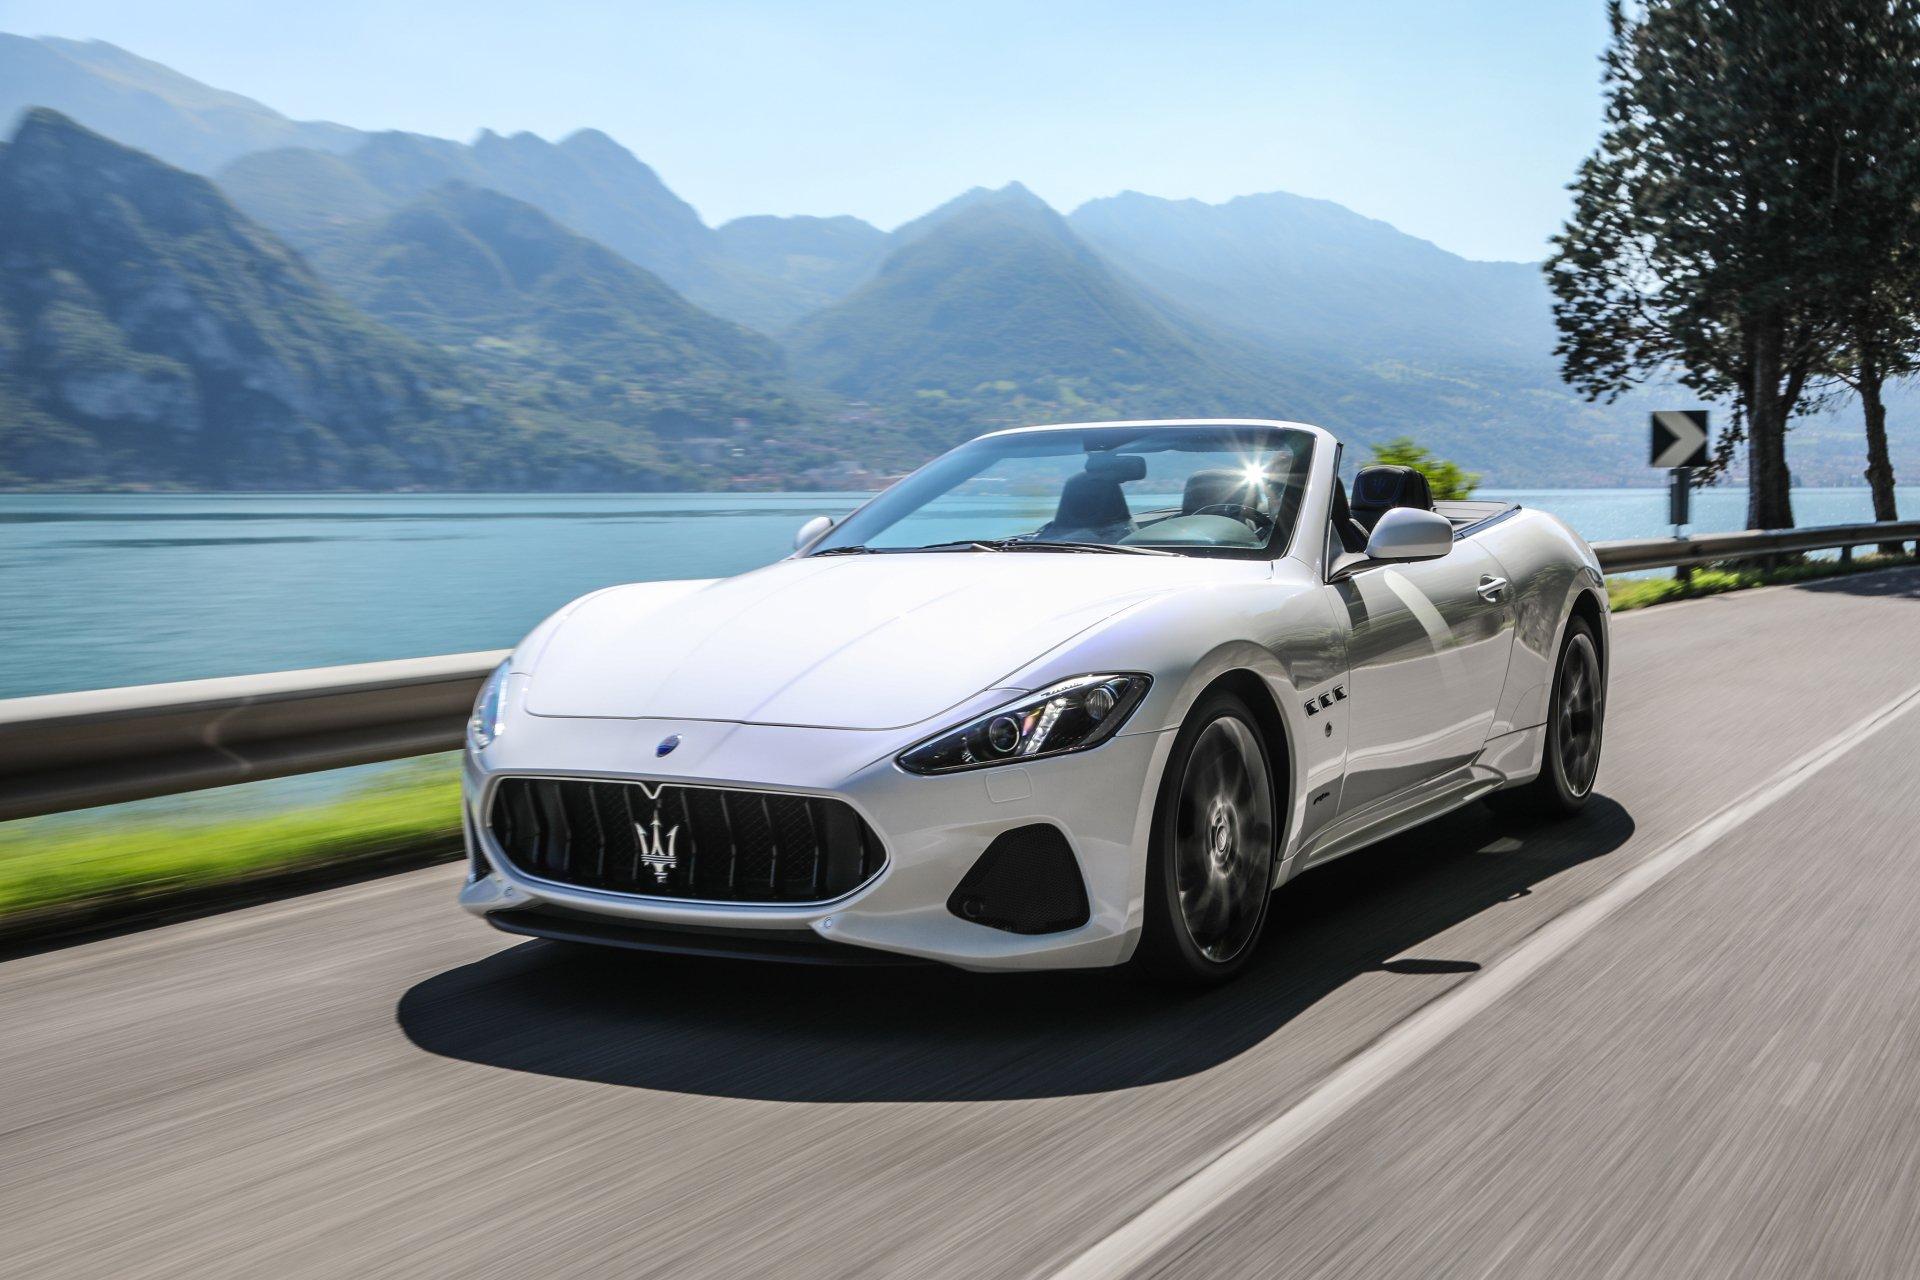 座驾 - Maserati GranCabrio  玛莎拉蒂 Cabriolet White Car 汽车 交通工具 Supercar Grand Tourer 壁纸